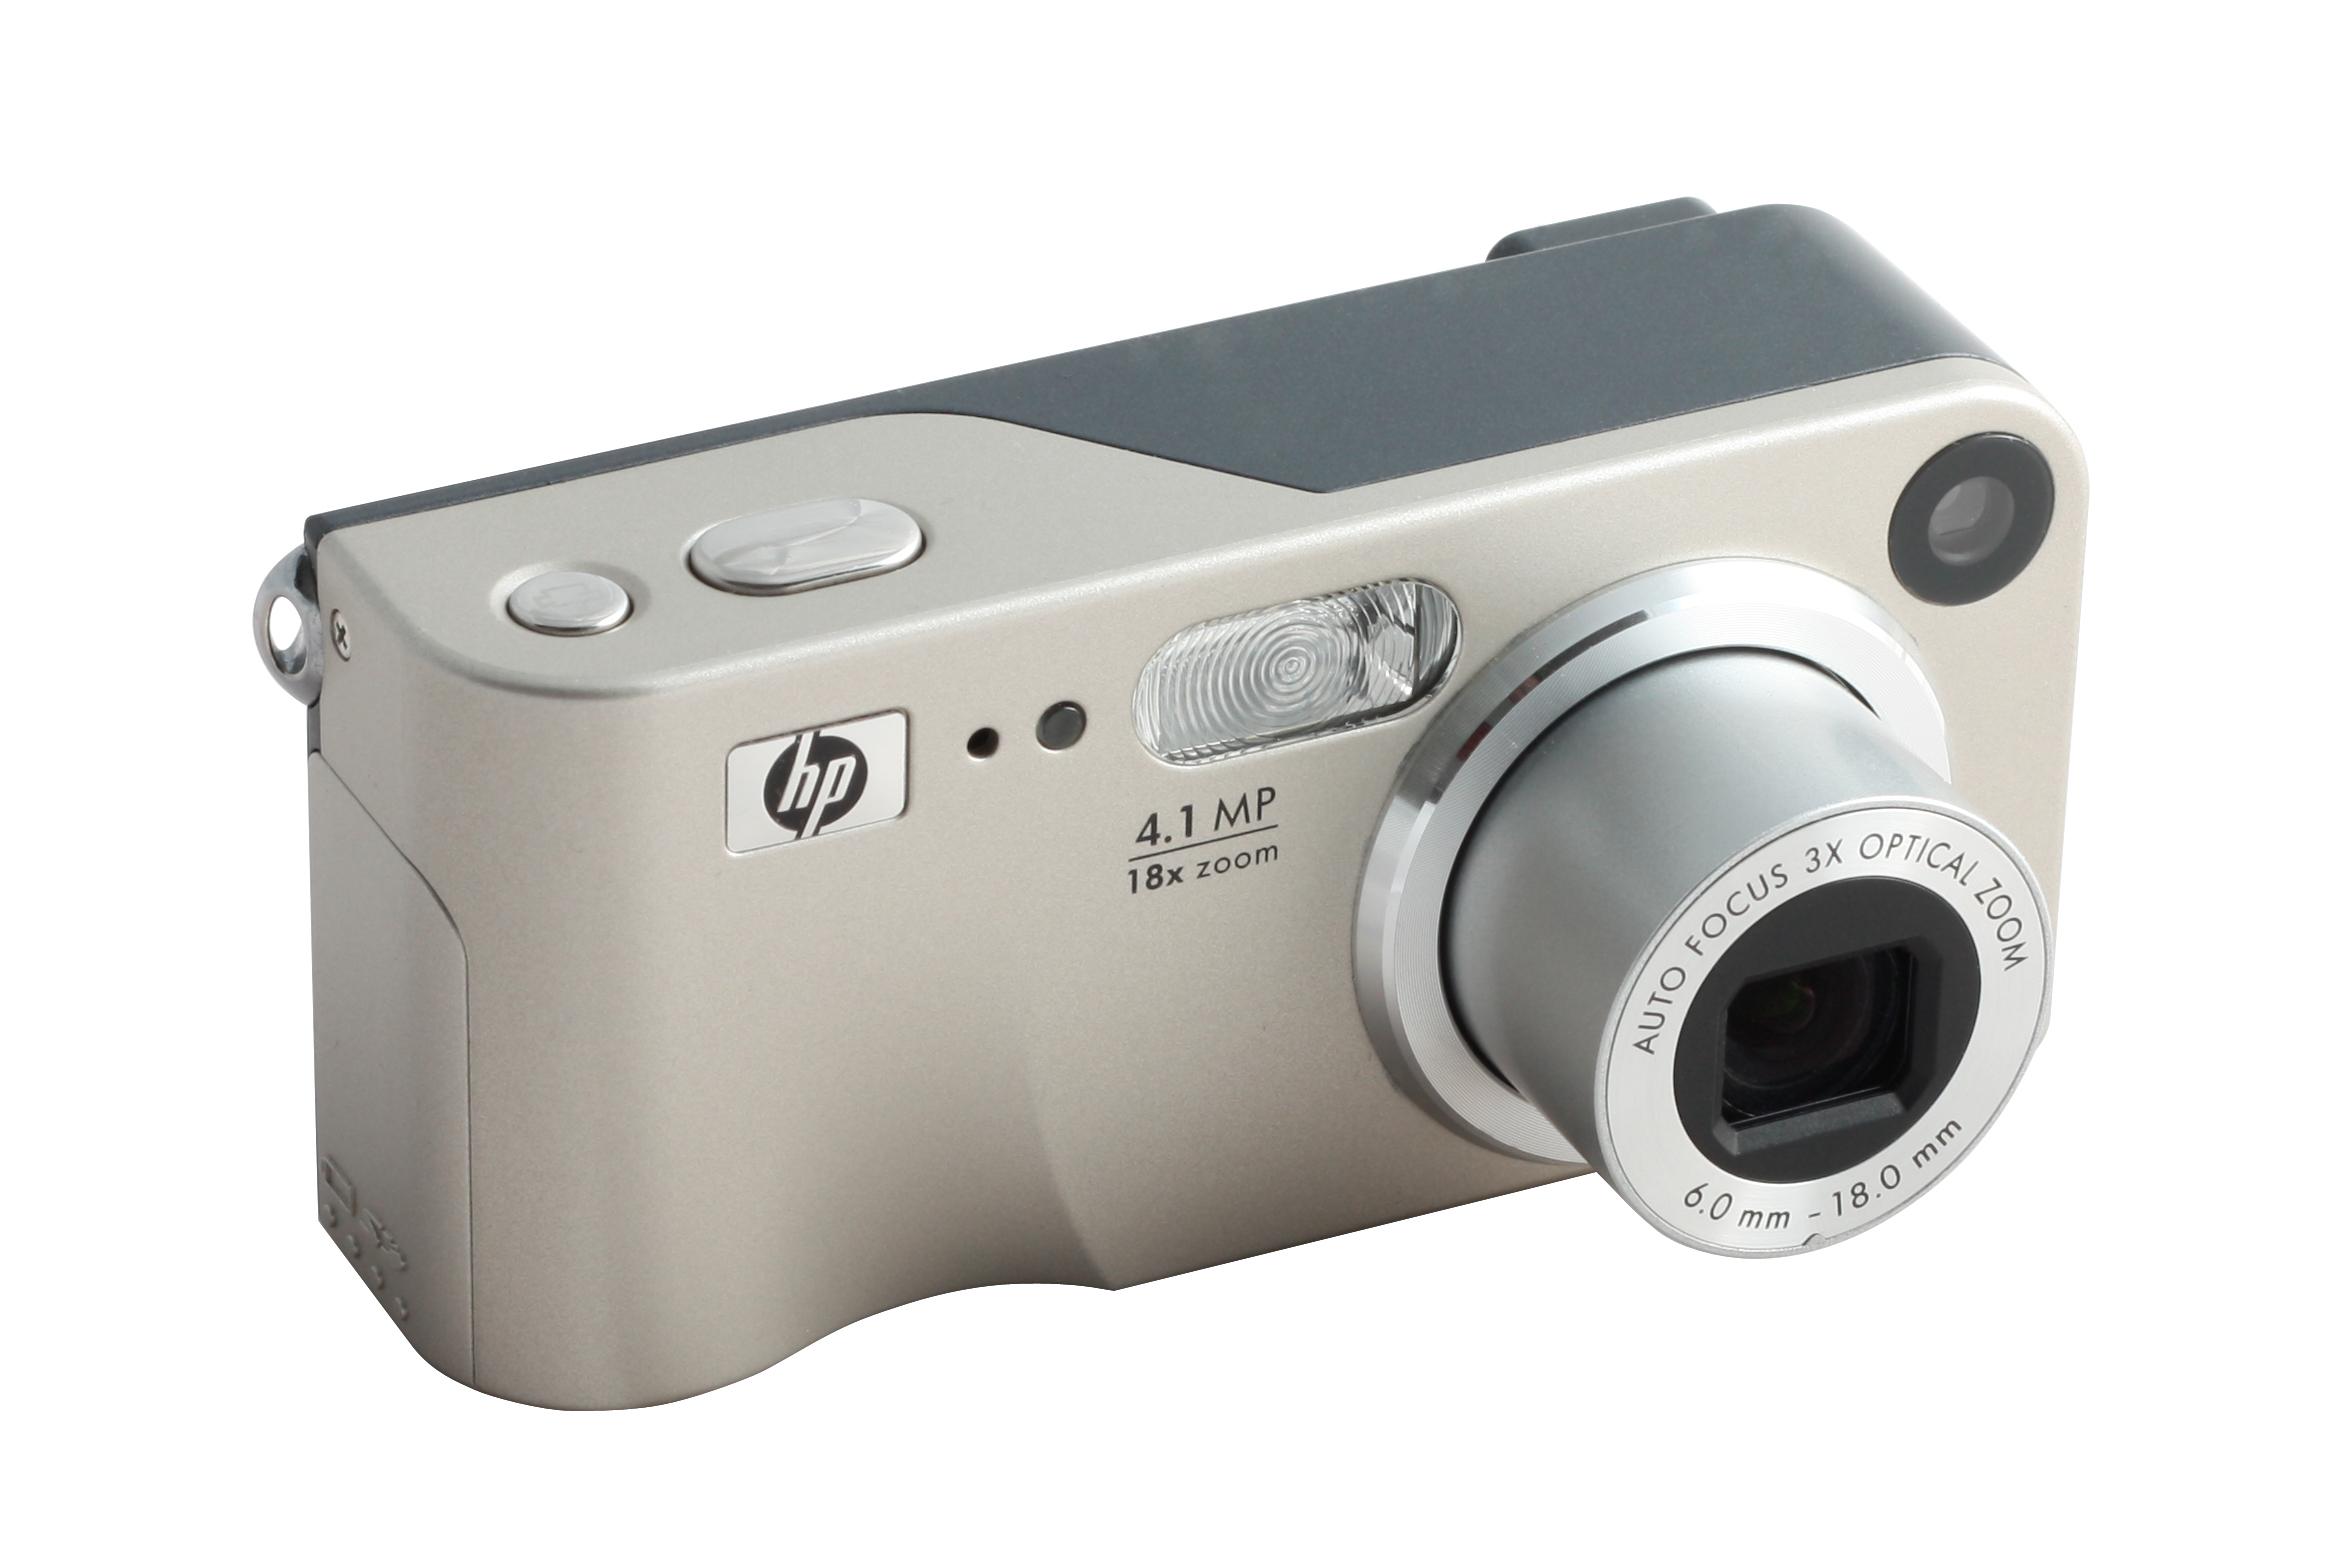 HP 733 PHOTOSMART DRIVERS FOR WINDOWS MAC